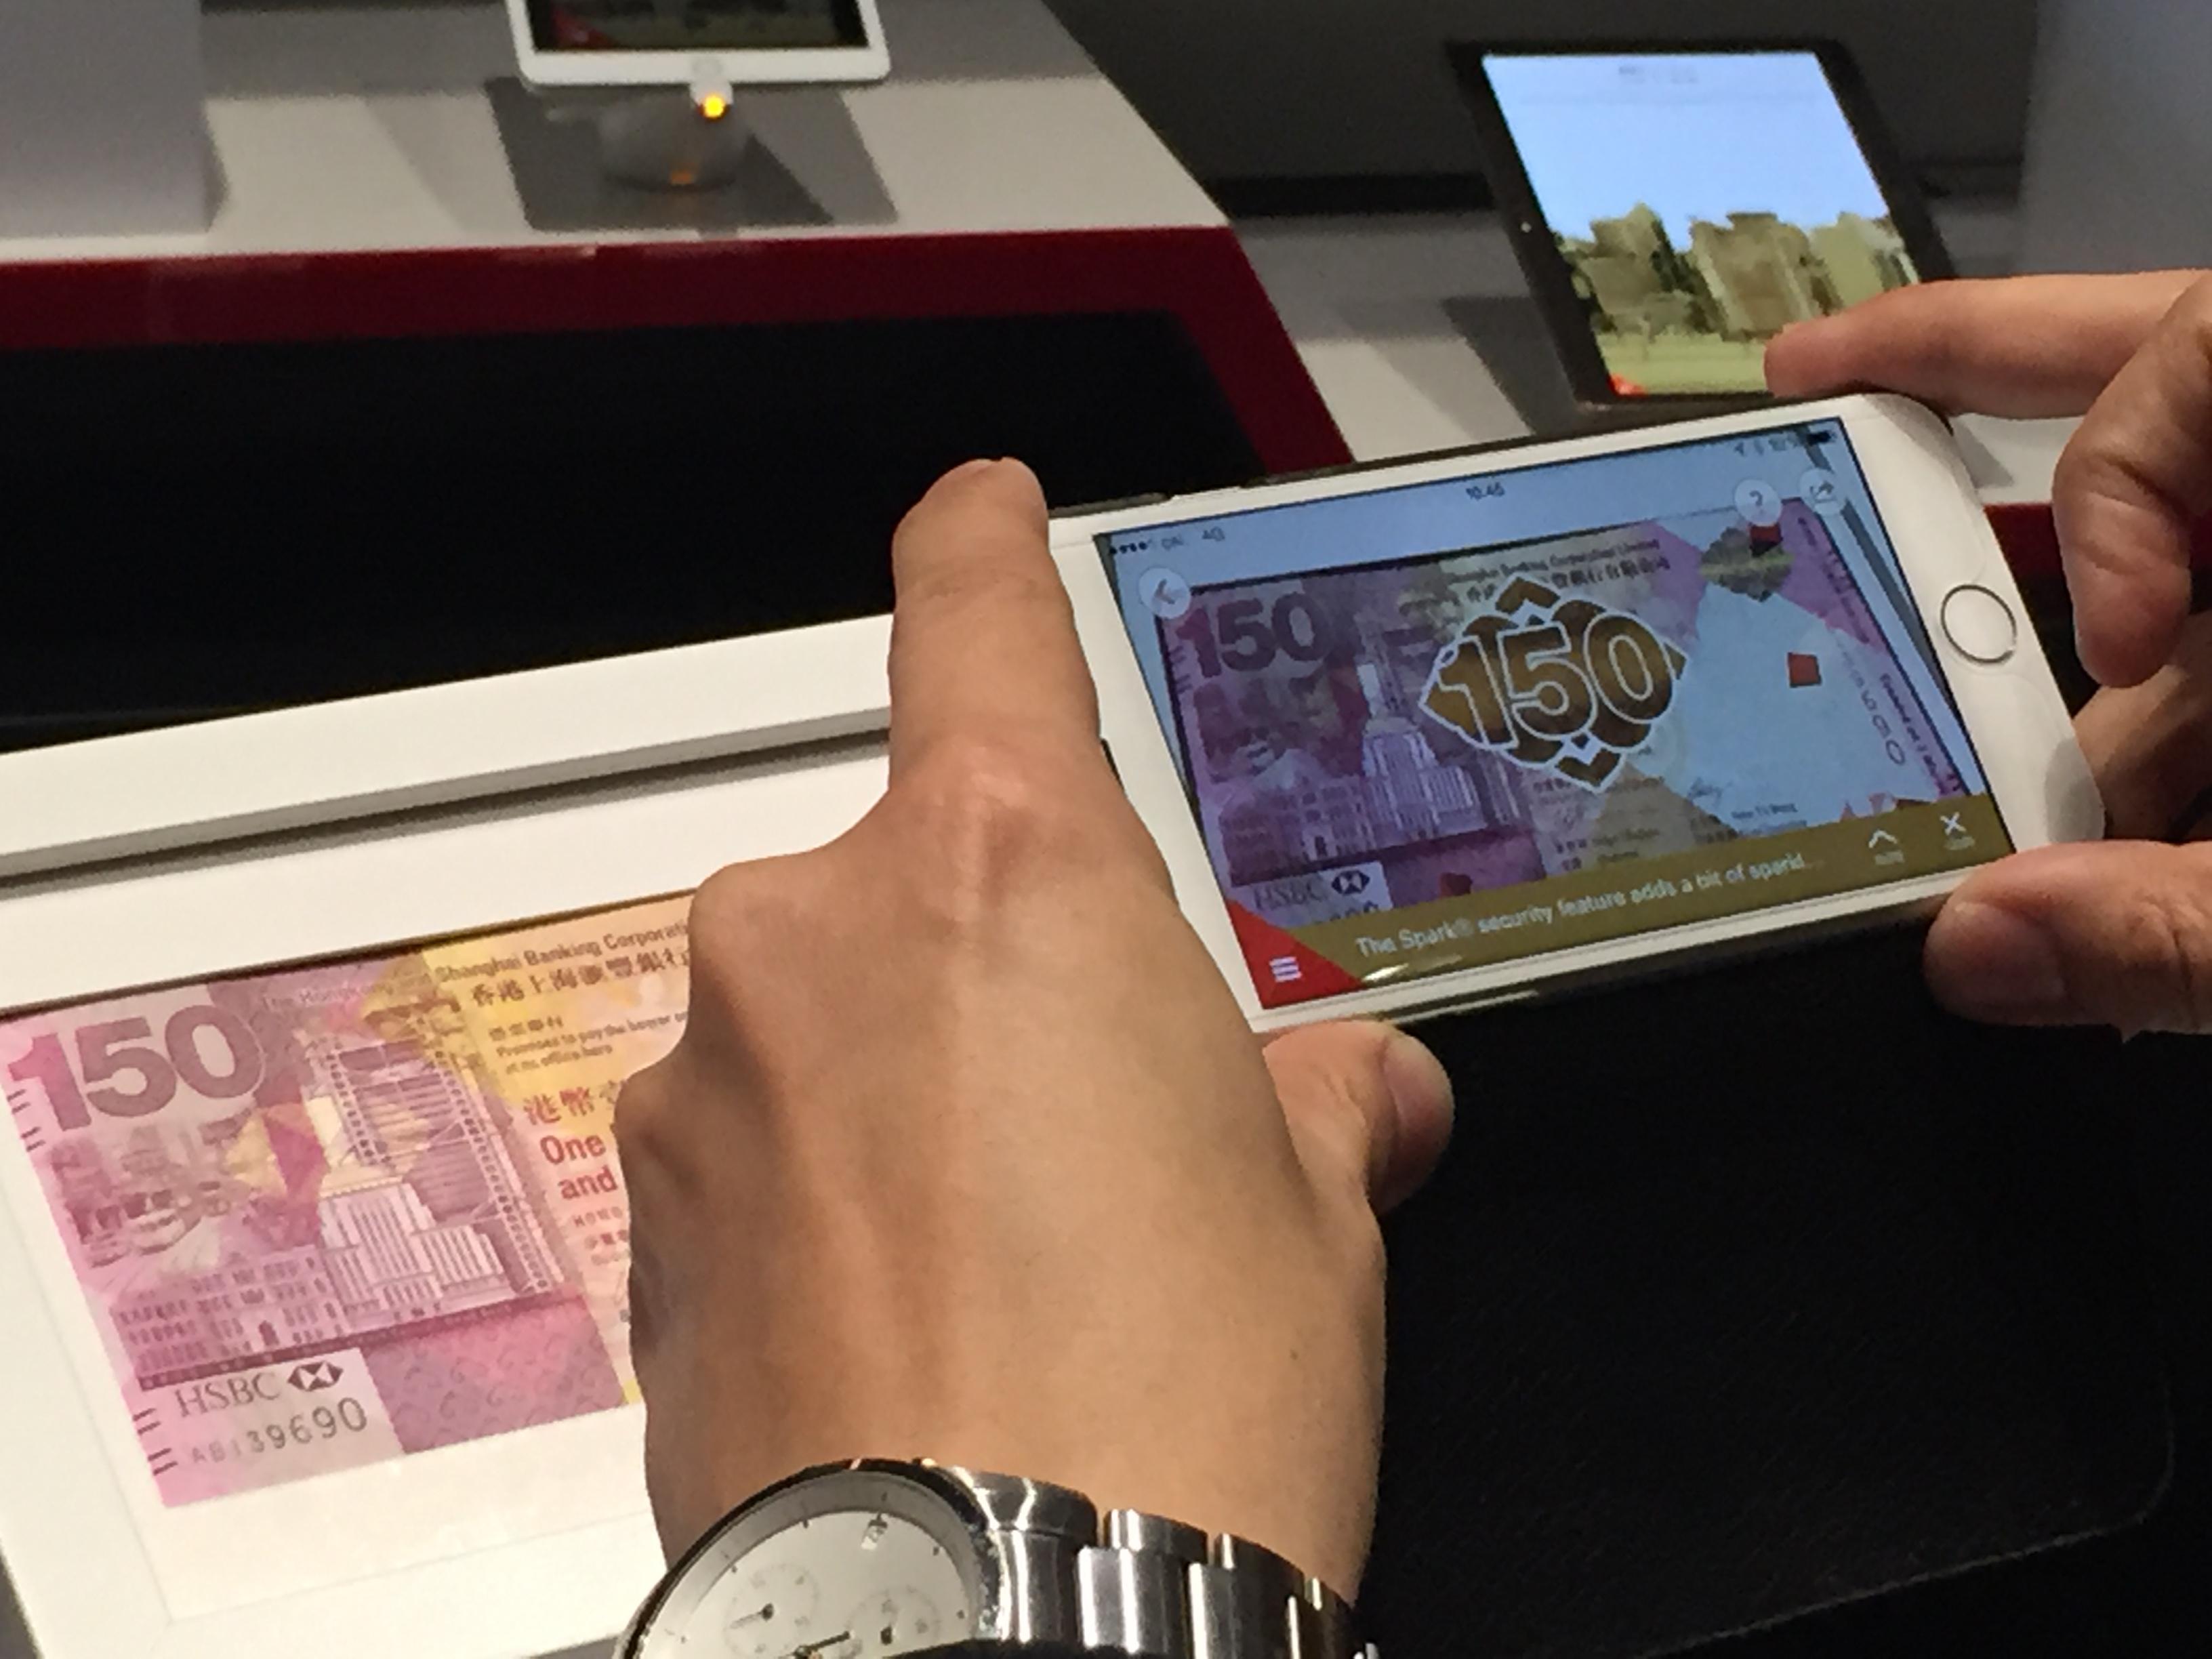 AR tech glams up HSBC HK$150 banknotes | Marketing Interactive